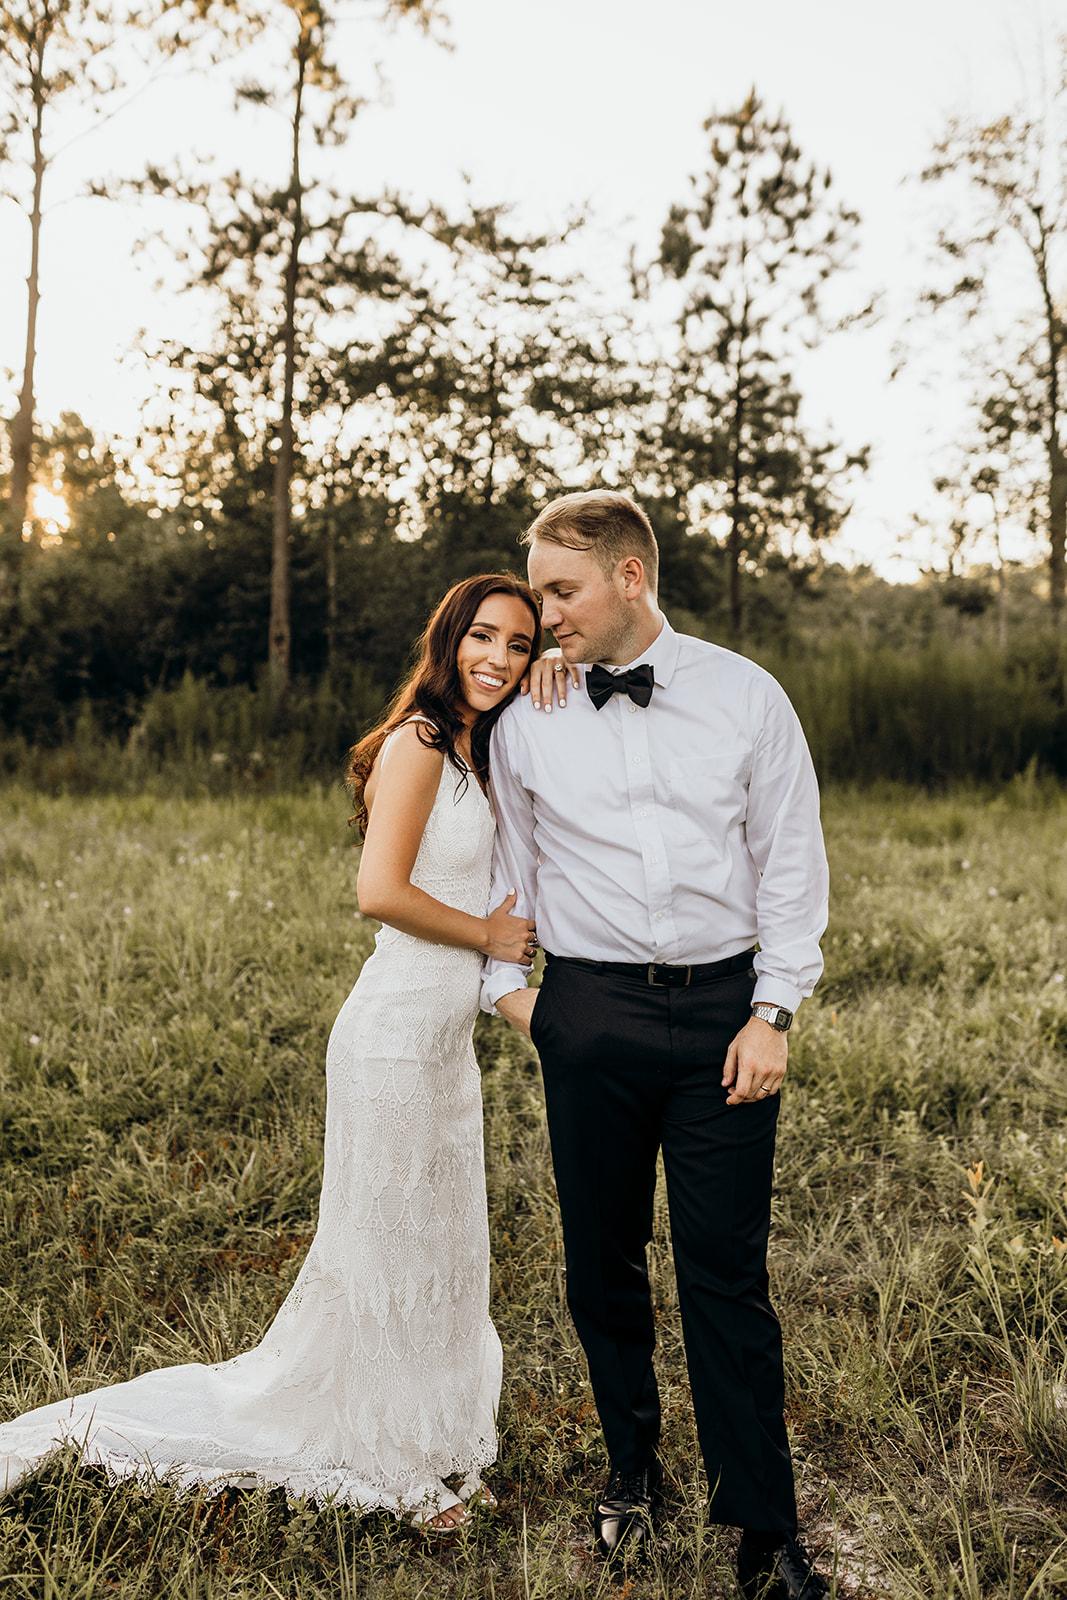 Casey-Josh-Pearl-In-The-Wild-Tallahassee-Wedding-181_websize.jpg